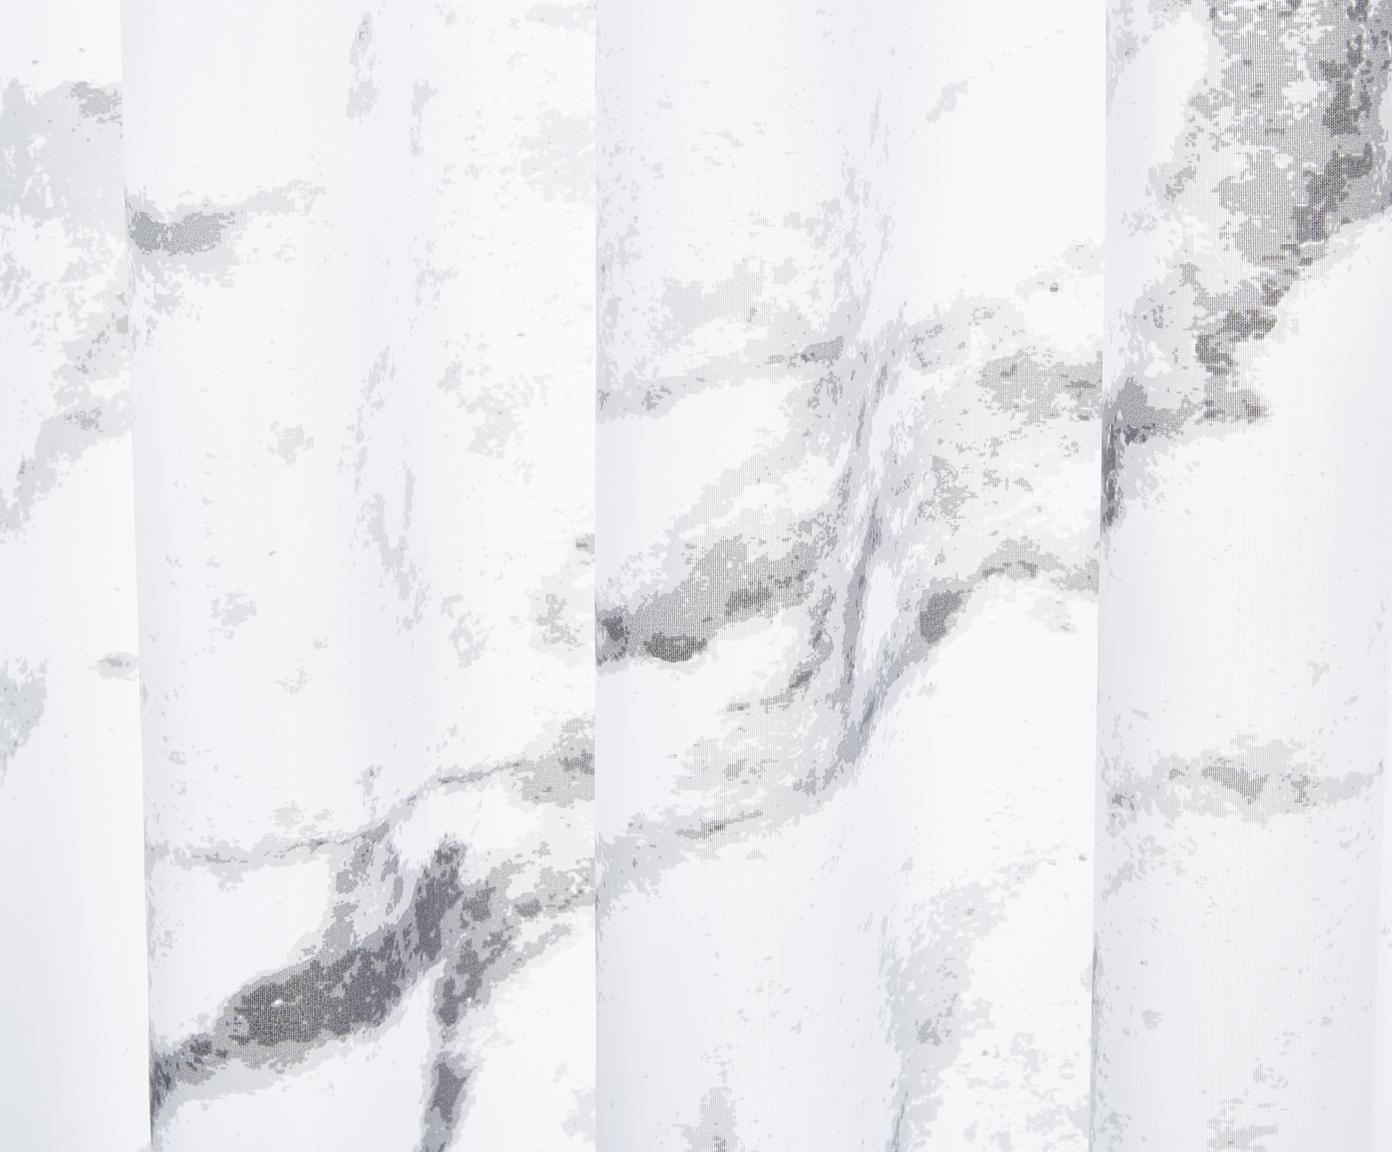 Douchegordijn Marble, Polyester Waterafstotend, niet waterdicht, Antraciet, wit, 180 x 200 cm